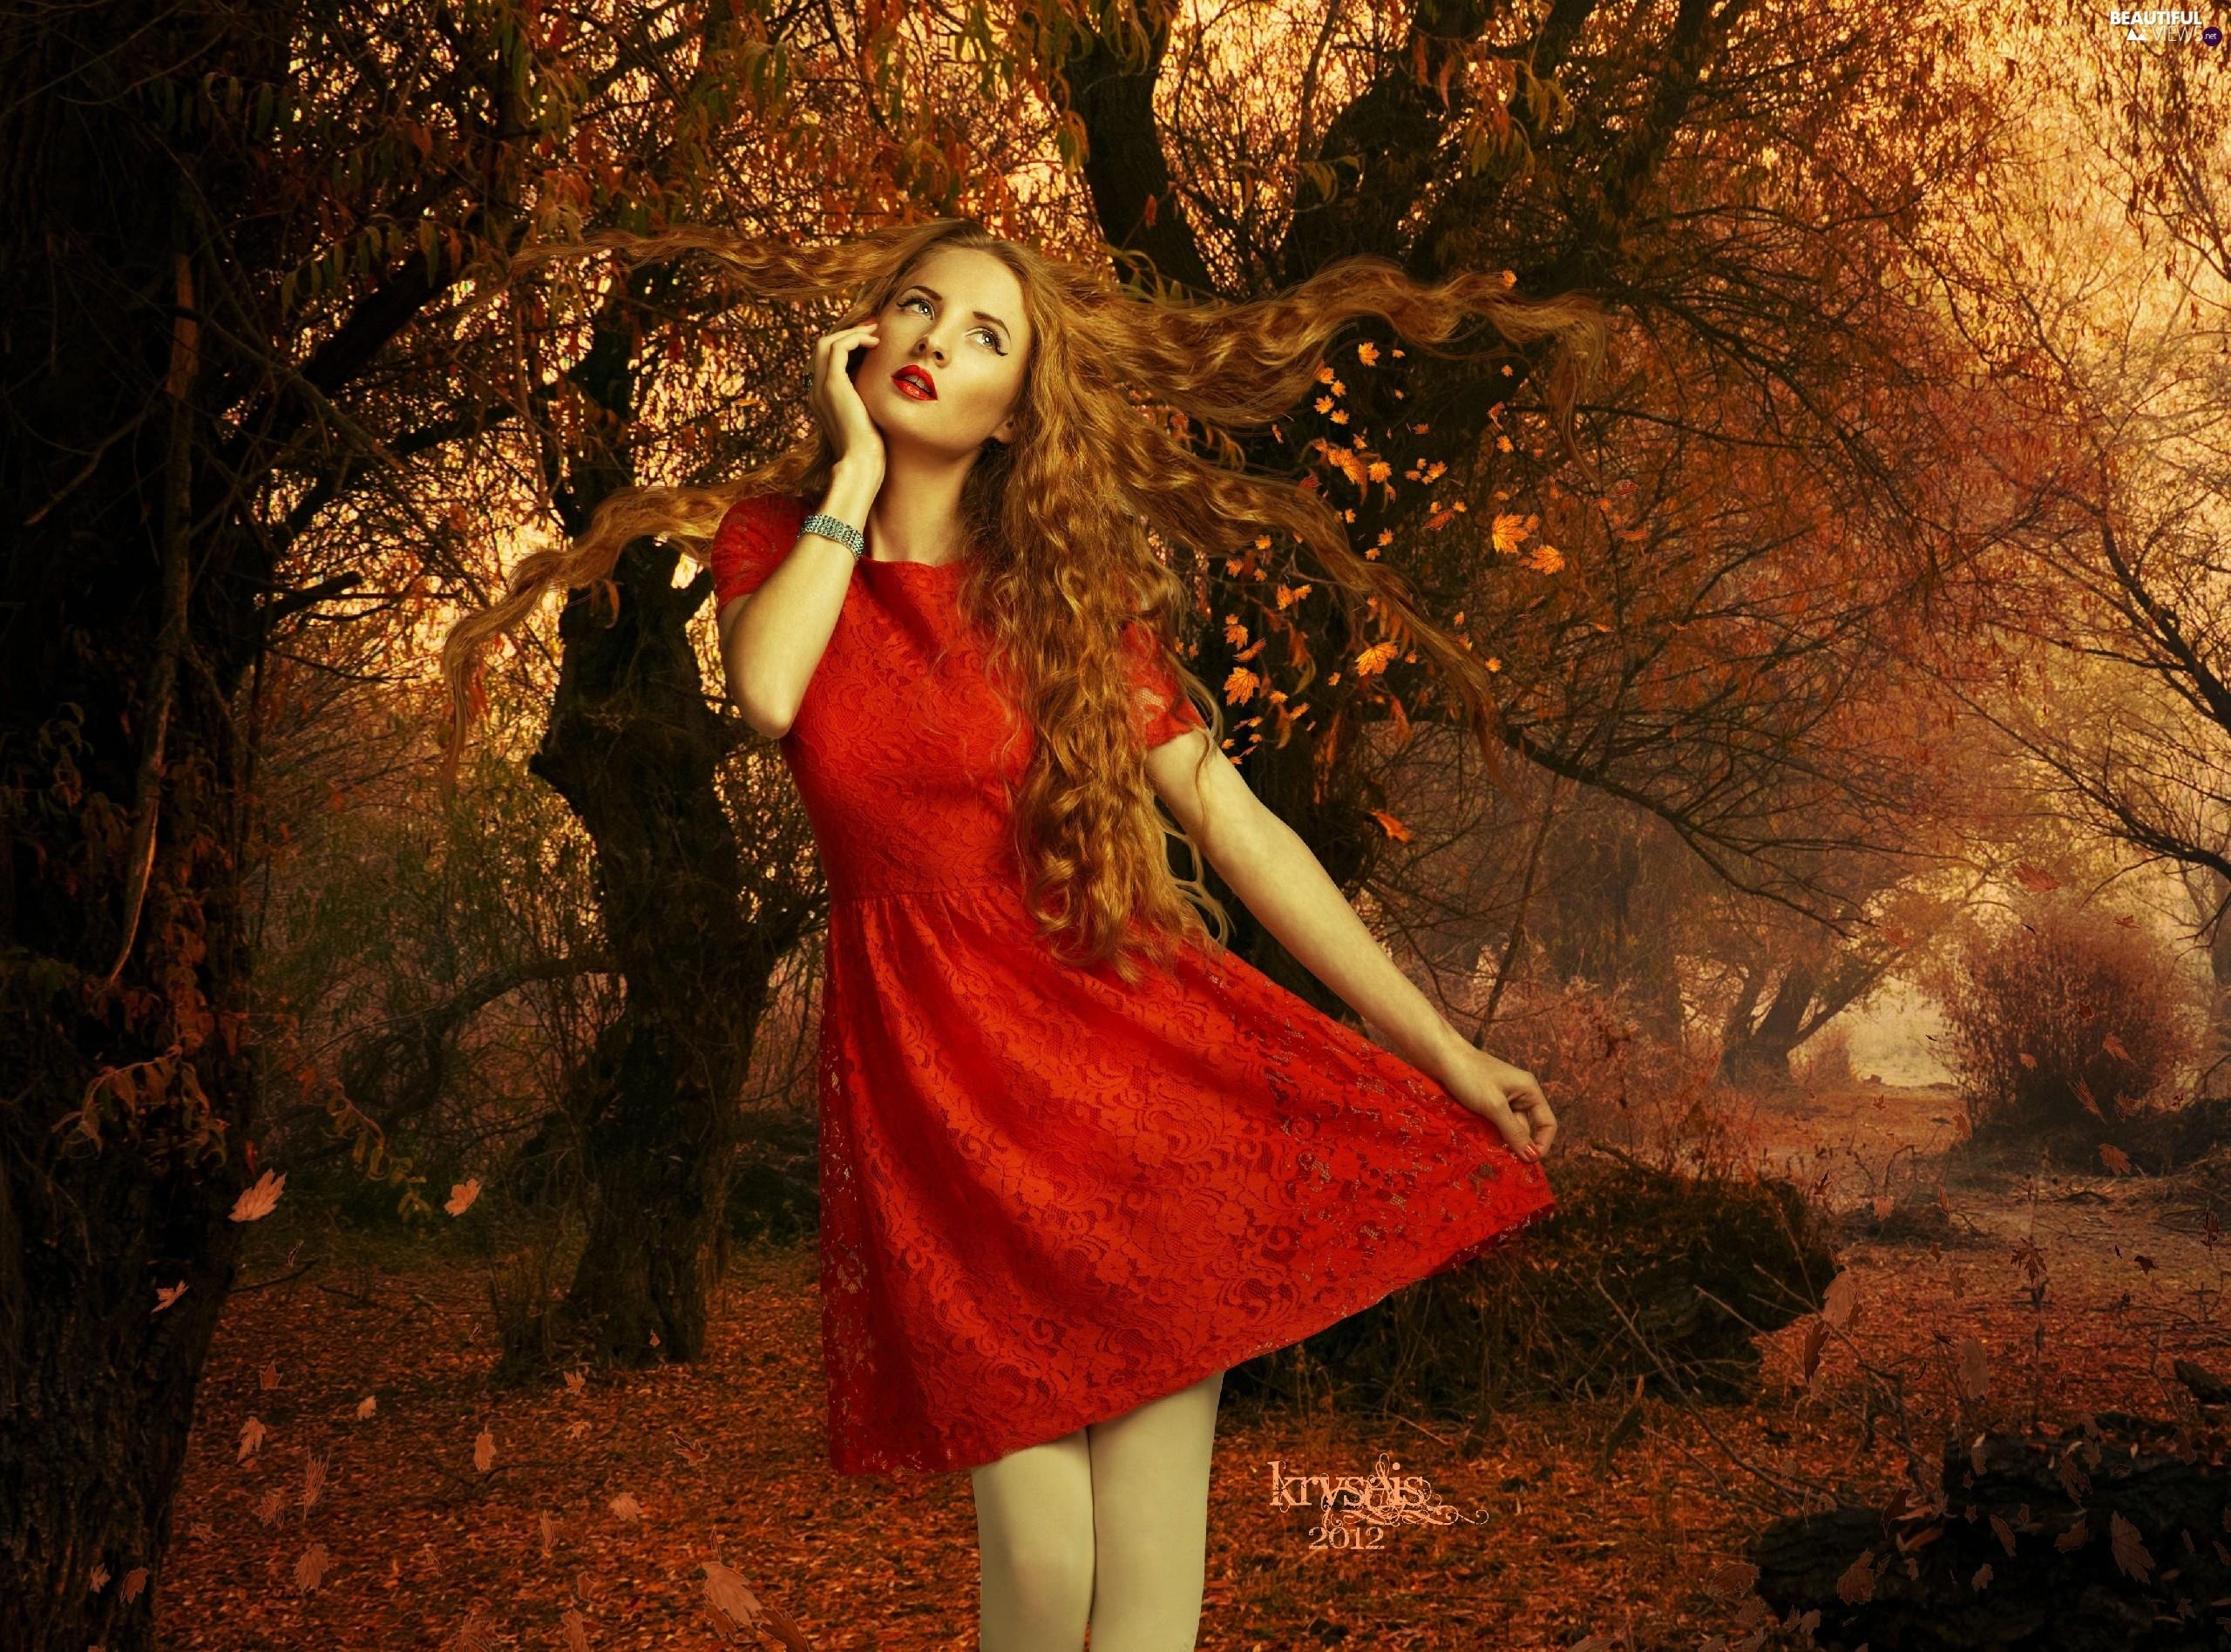 autumn, Leaf, red hot, dress, Women